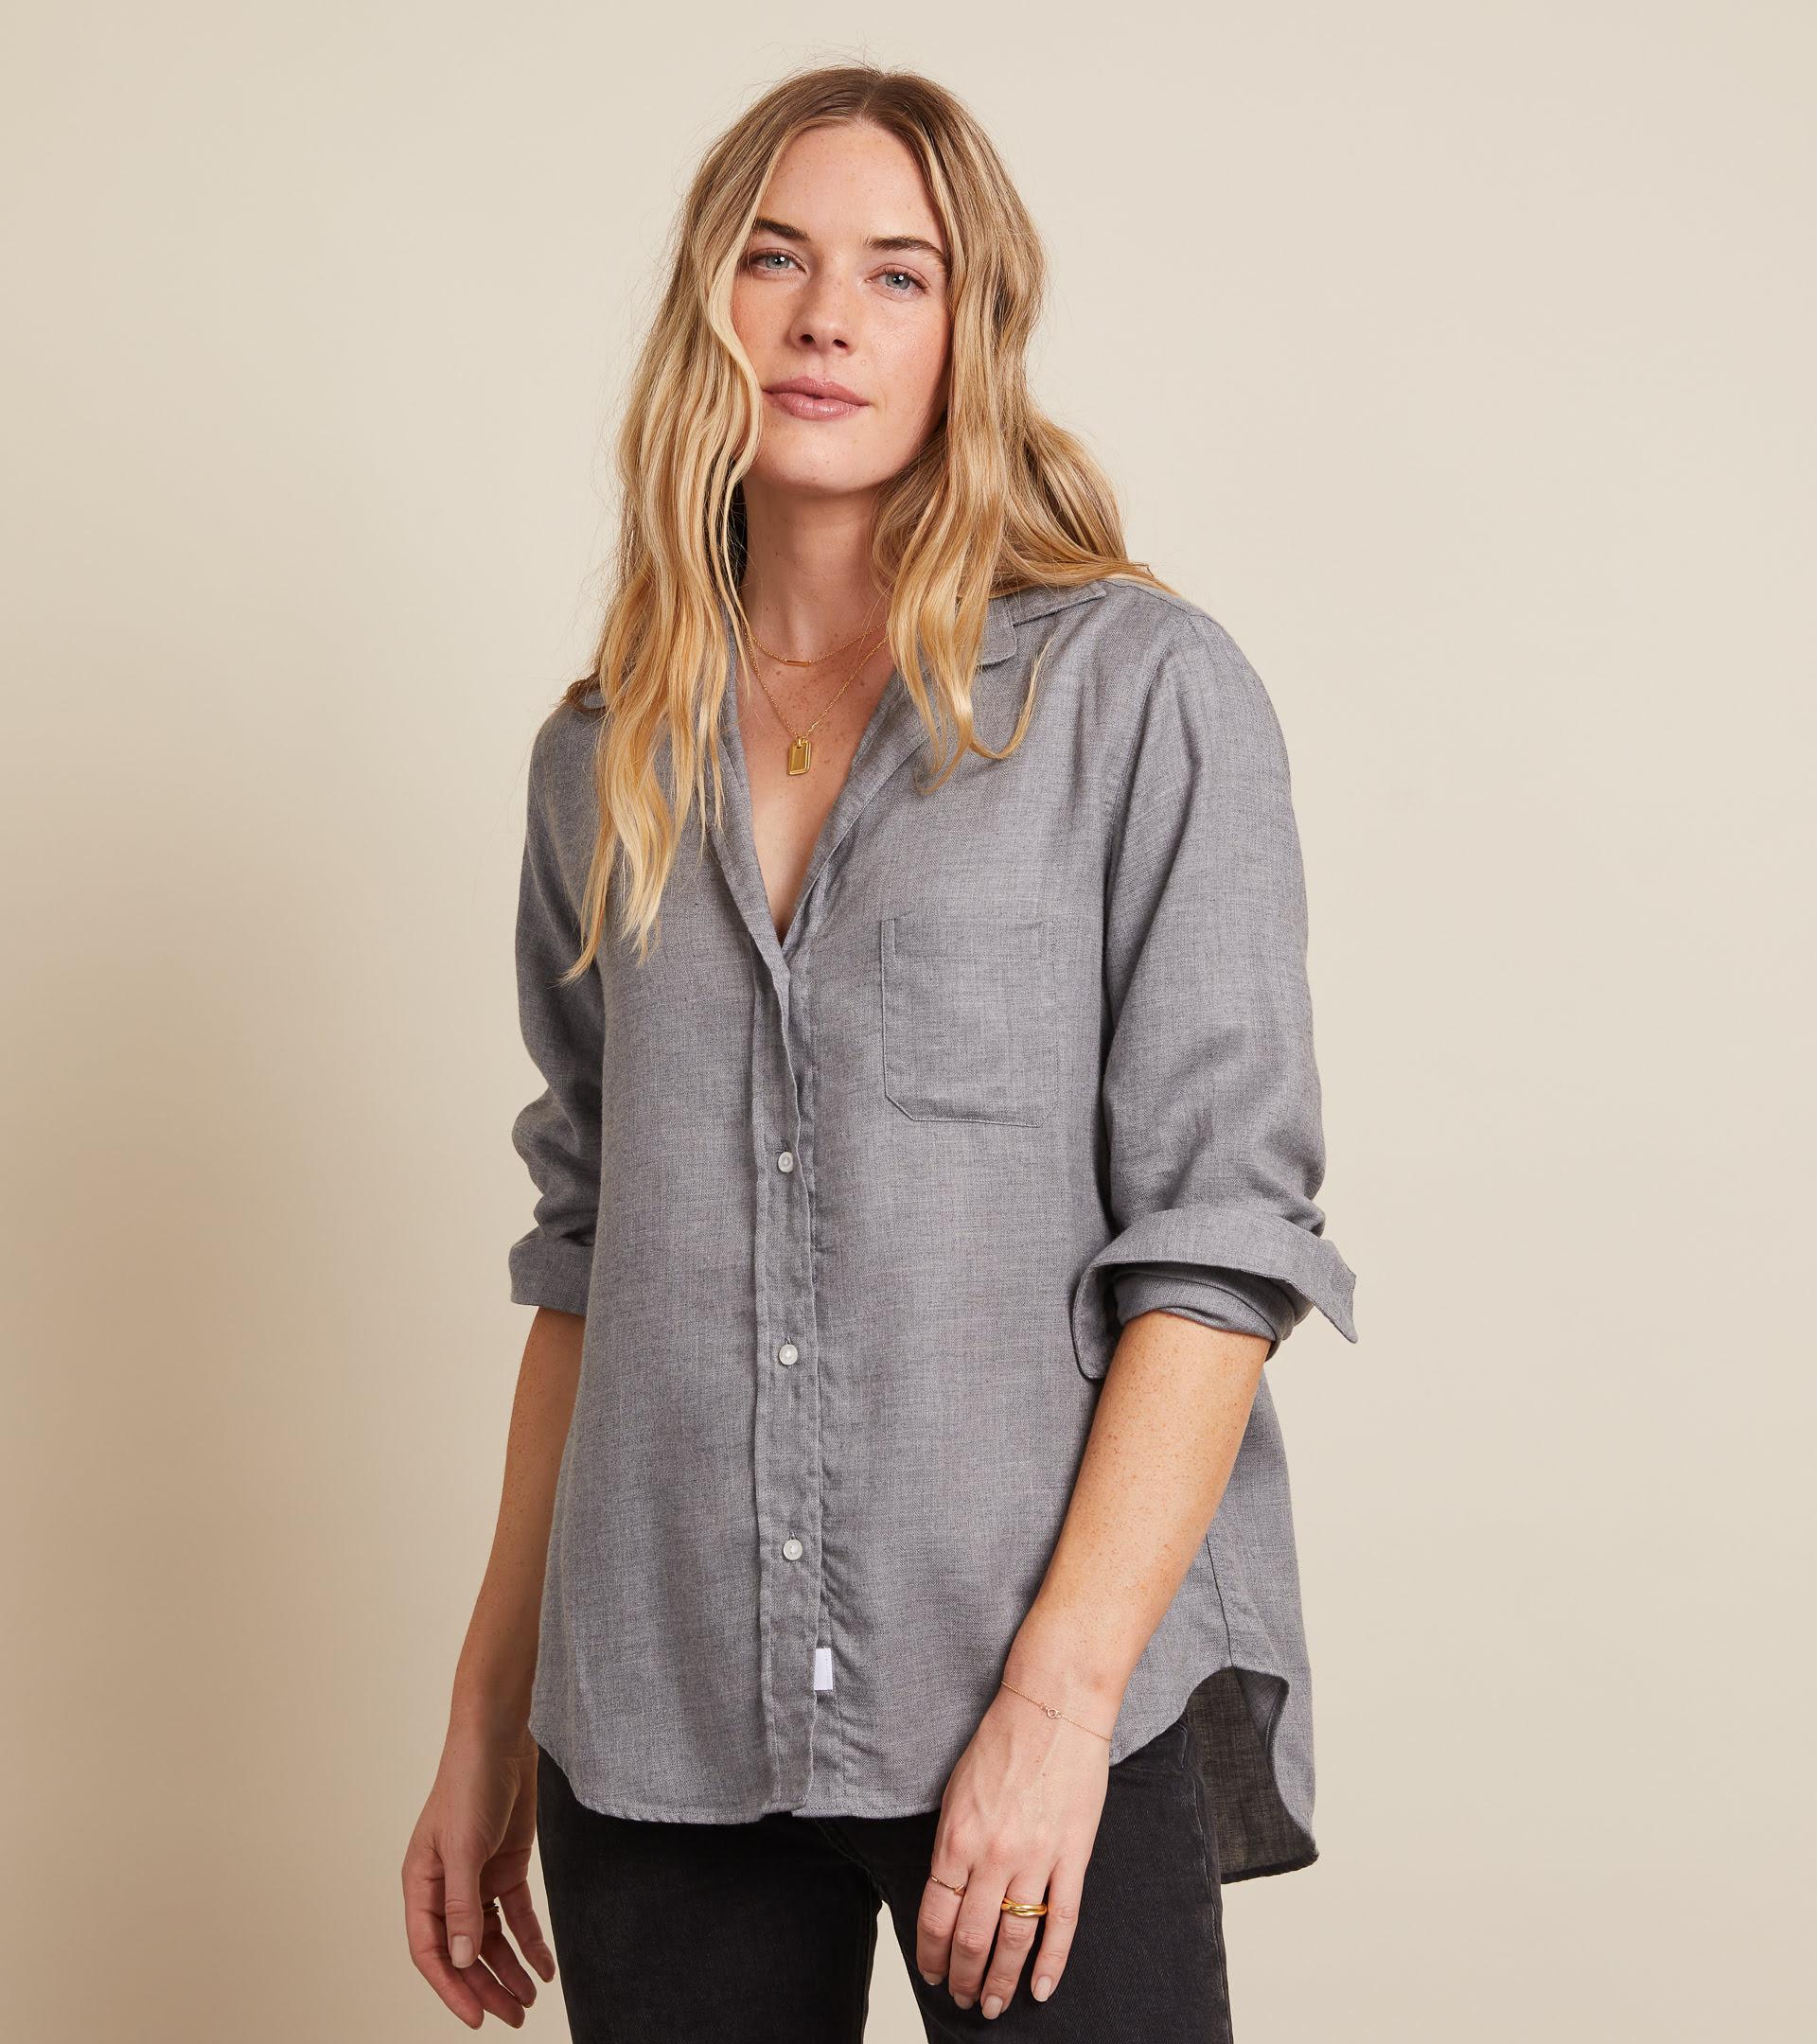 The Hero Button-Up Shirt Gray Melange, Liquid Flannel view 2